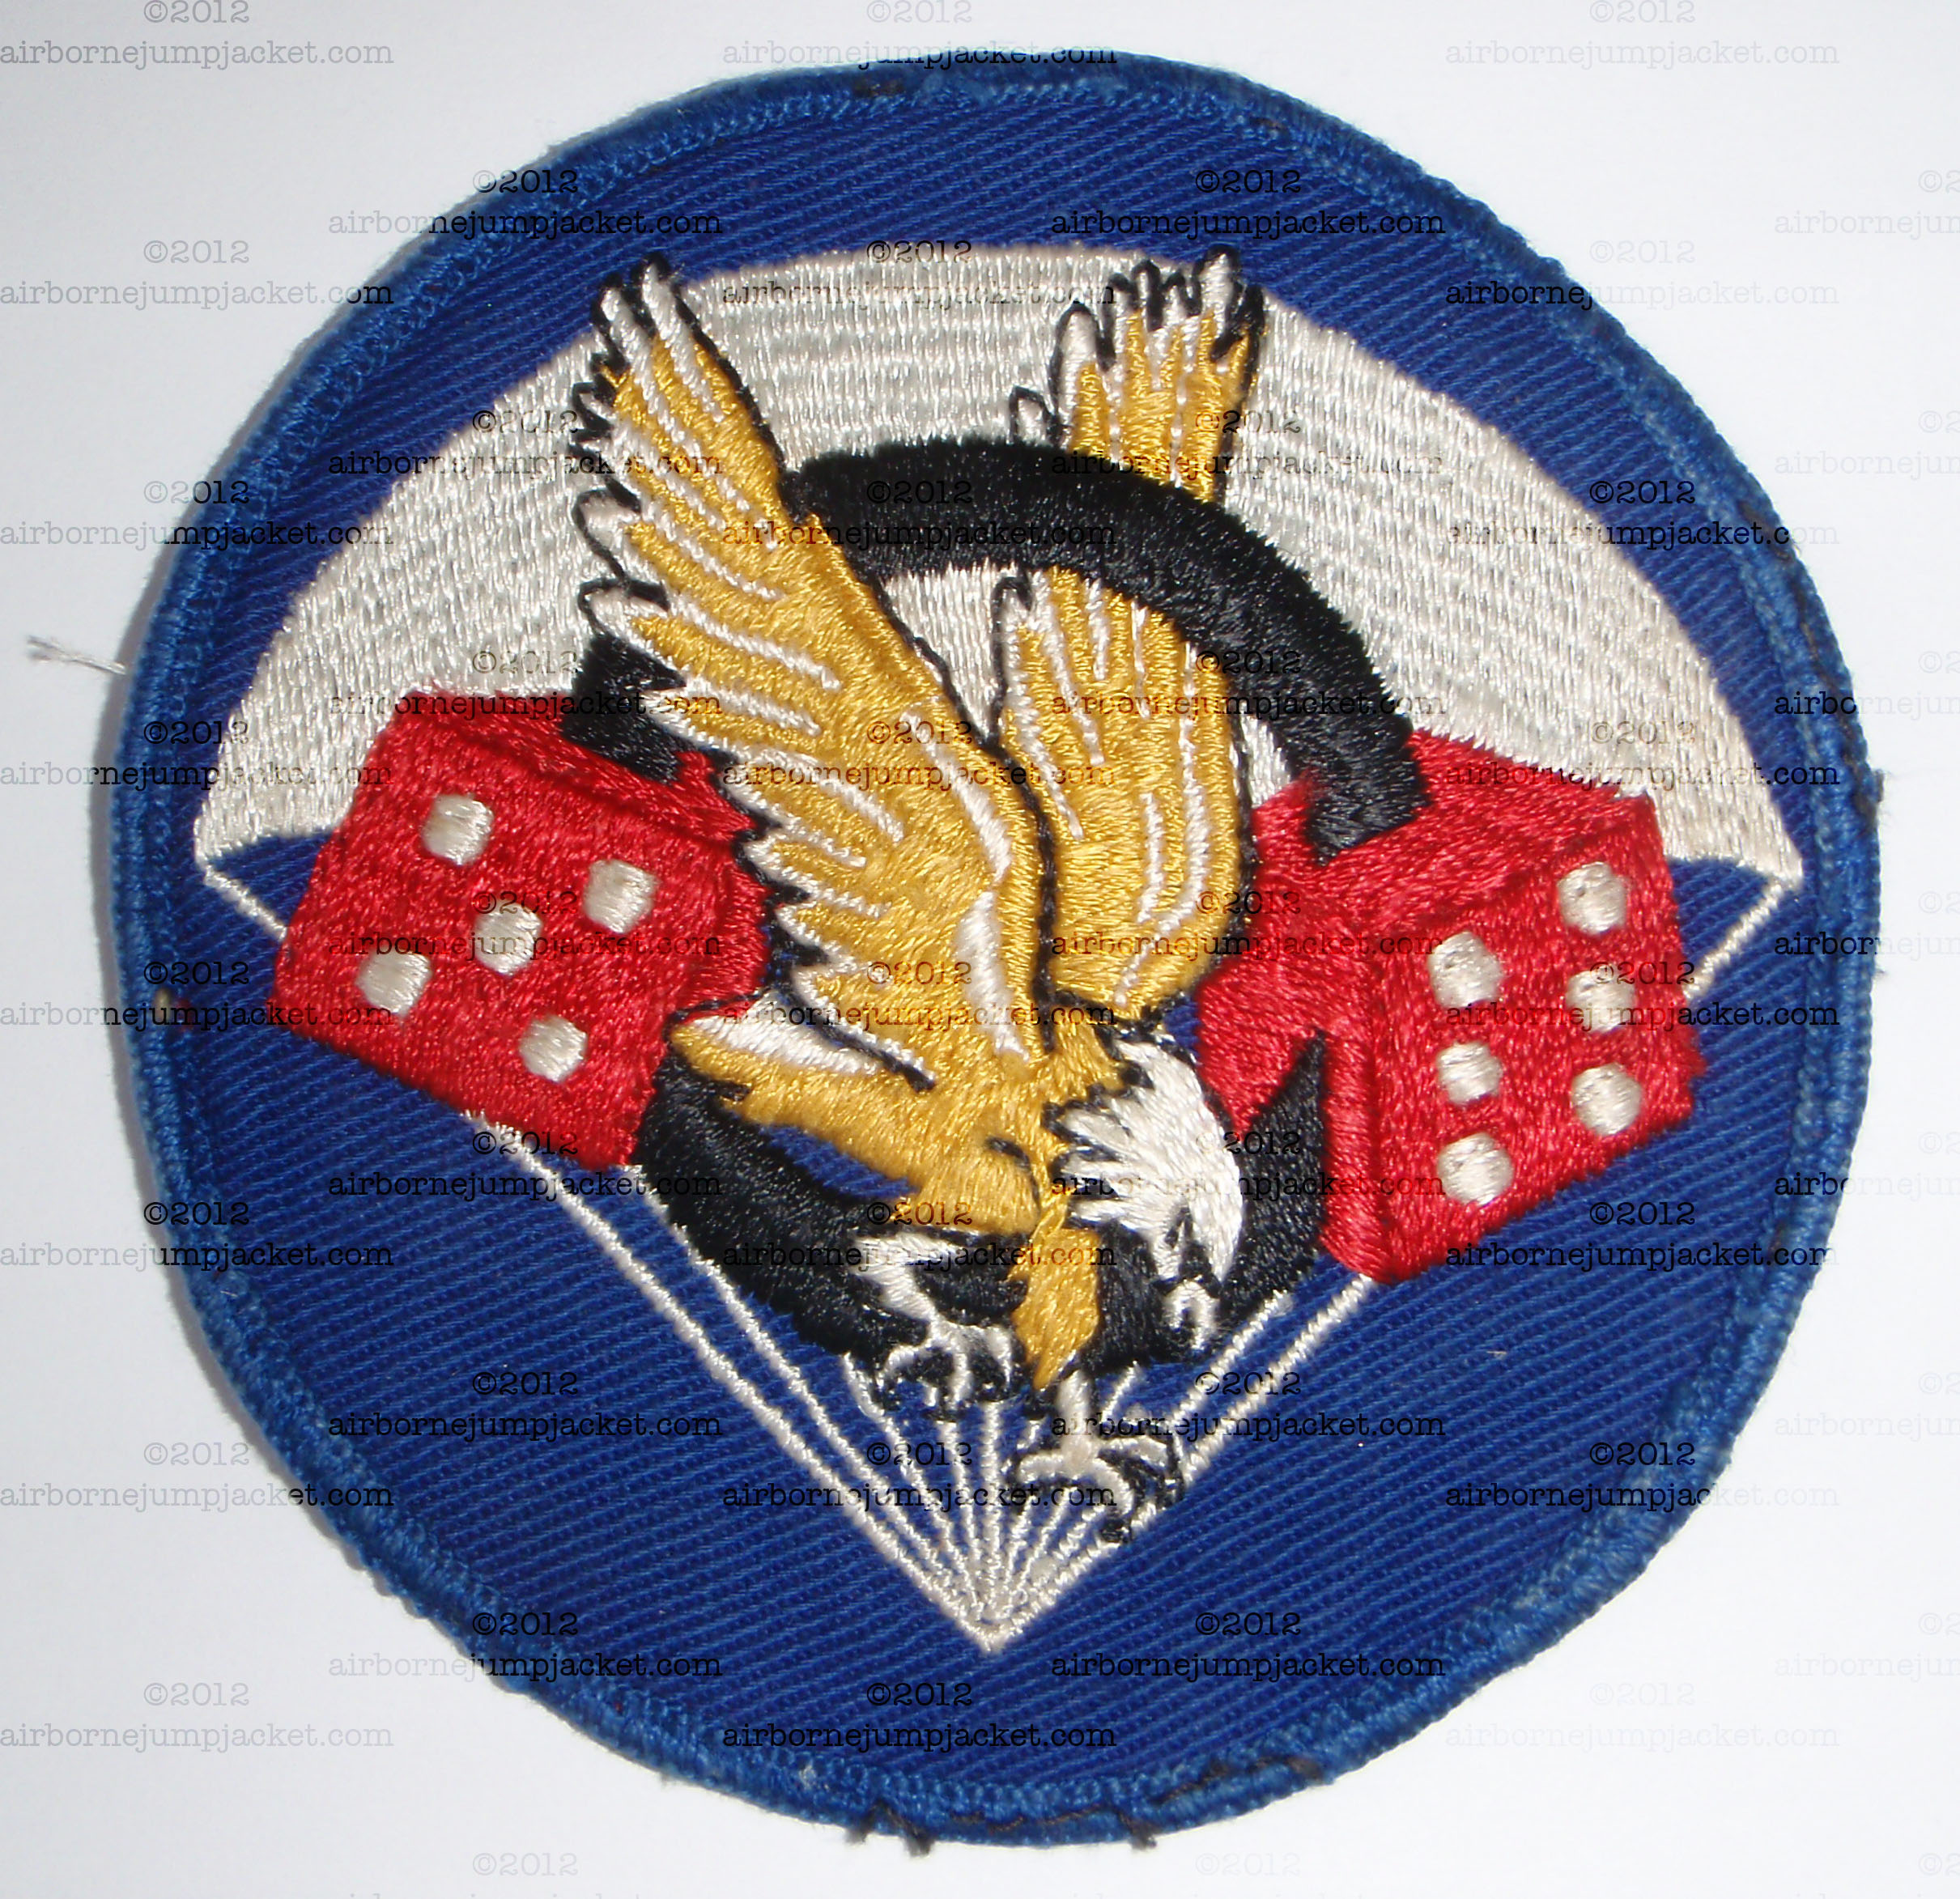 airbornejumpjacket.com